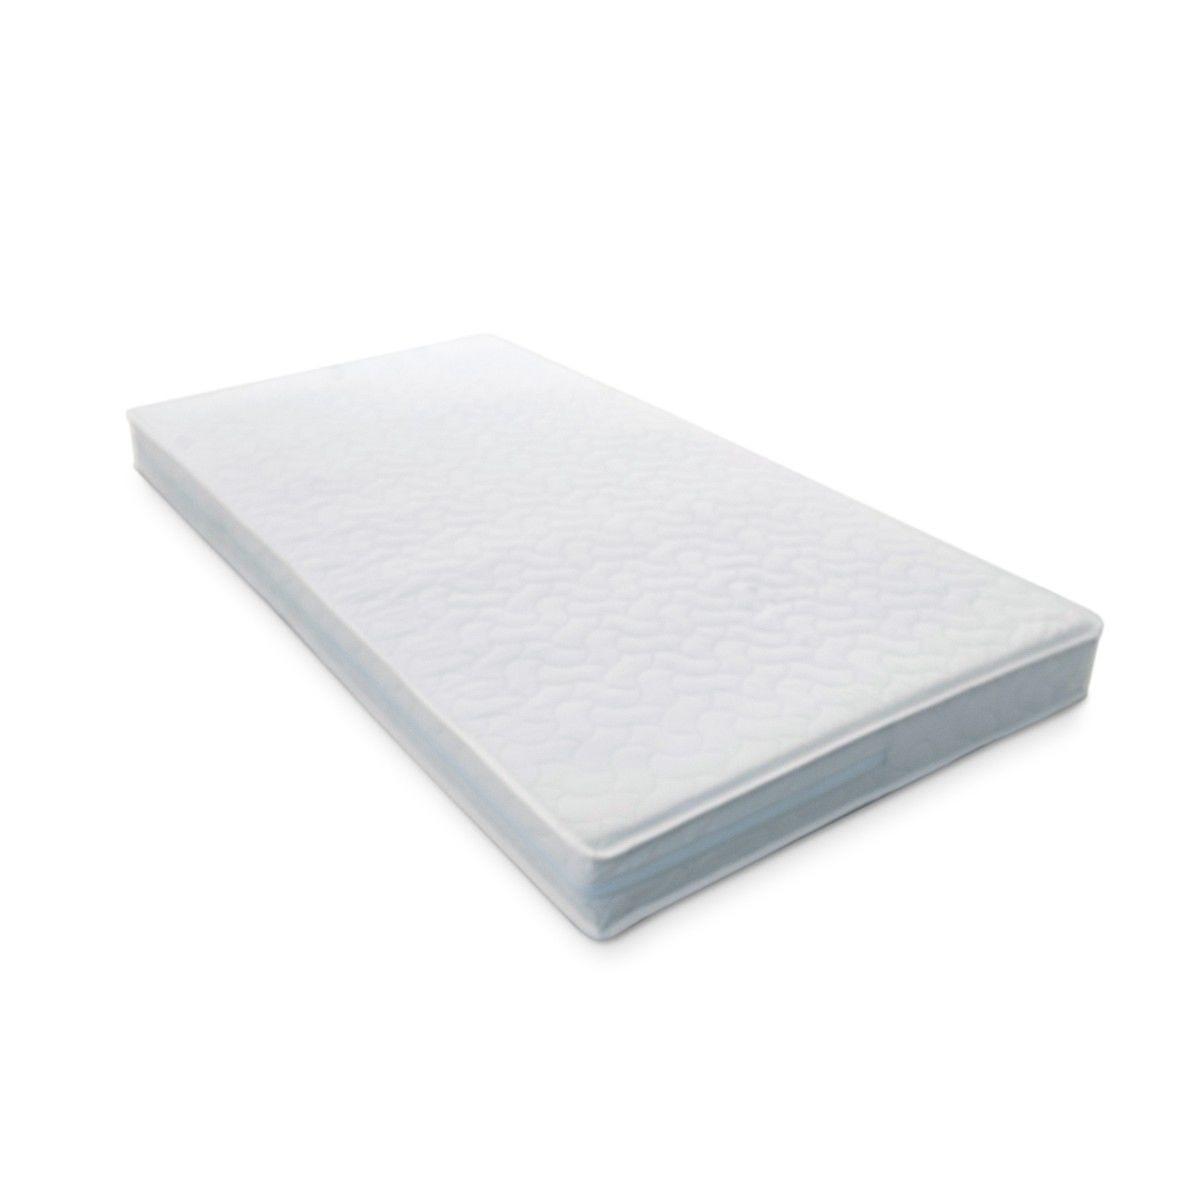 Ickle Bubba Pocket Sprung Cot Bed Mattress 140 x 70cm